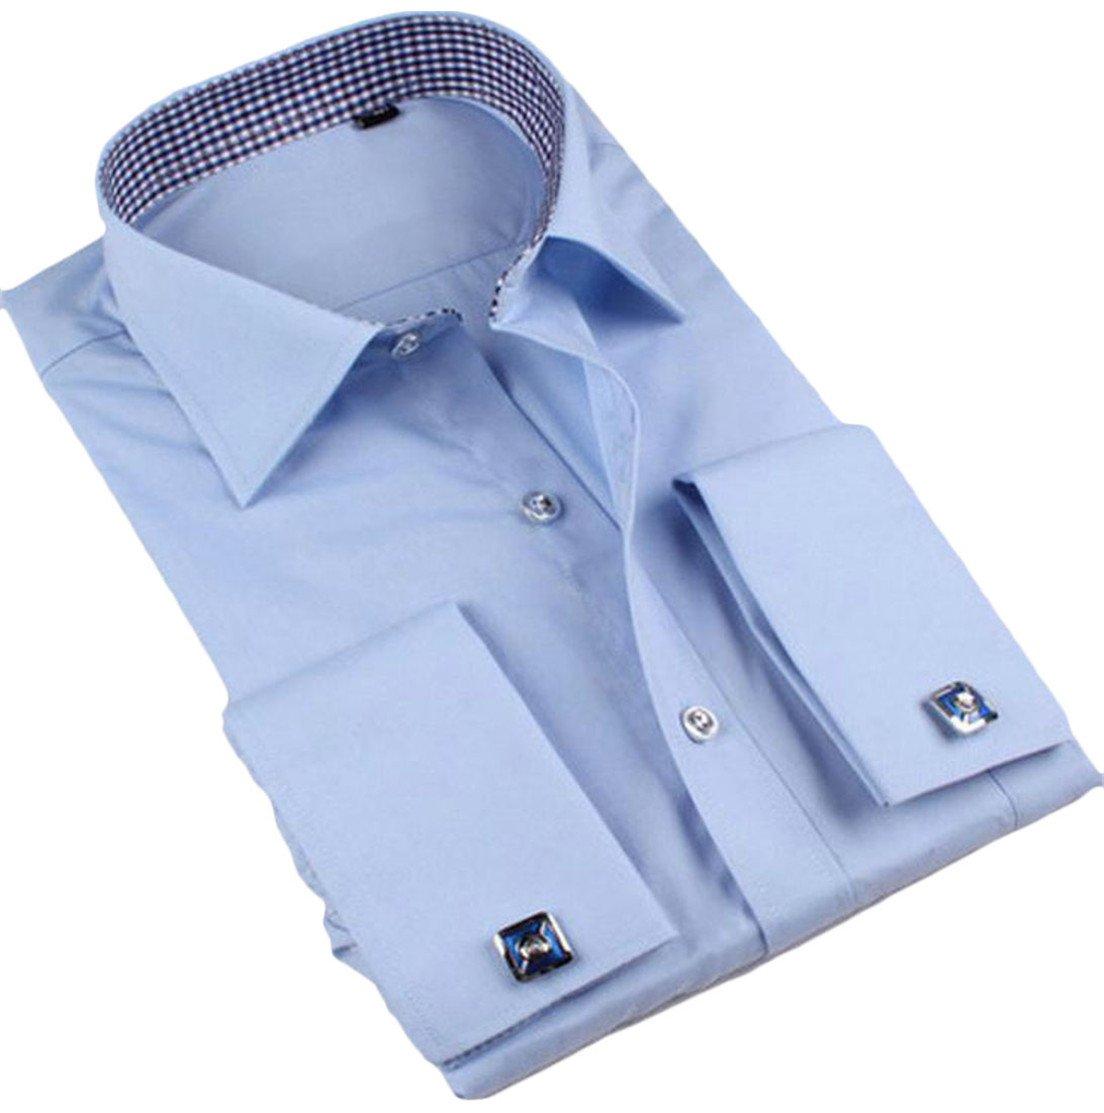 Etecredpow Men Long Sleeve Lapel Neck Cufflinks Pocket Slim Button Down Shirts Blue XXL by Etecredpow (Image #1)